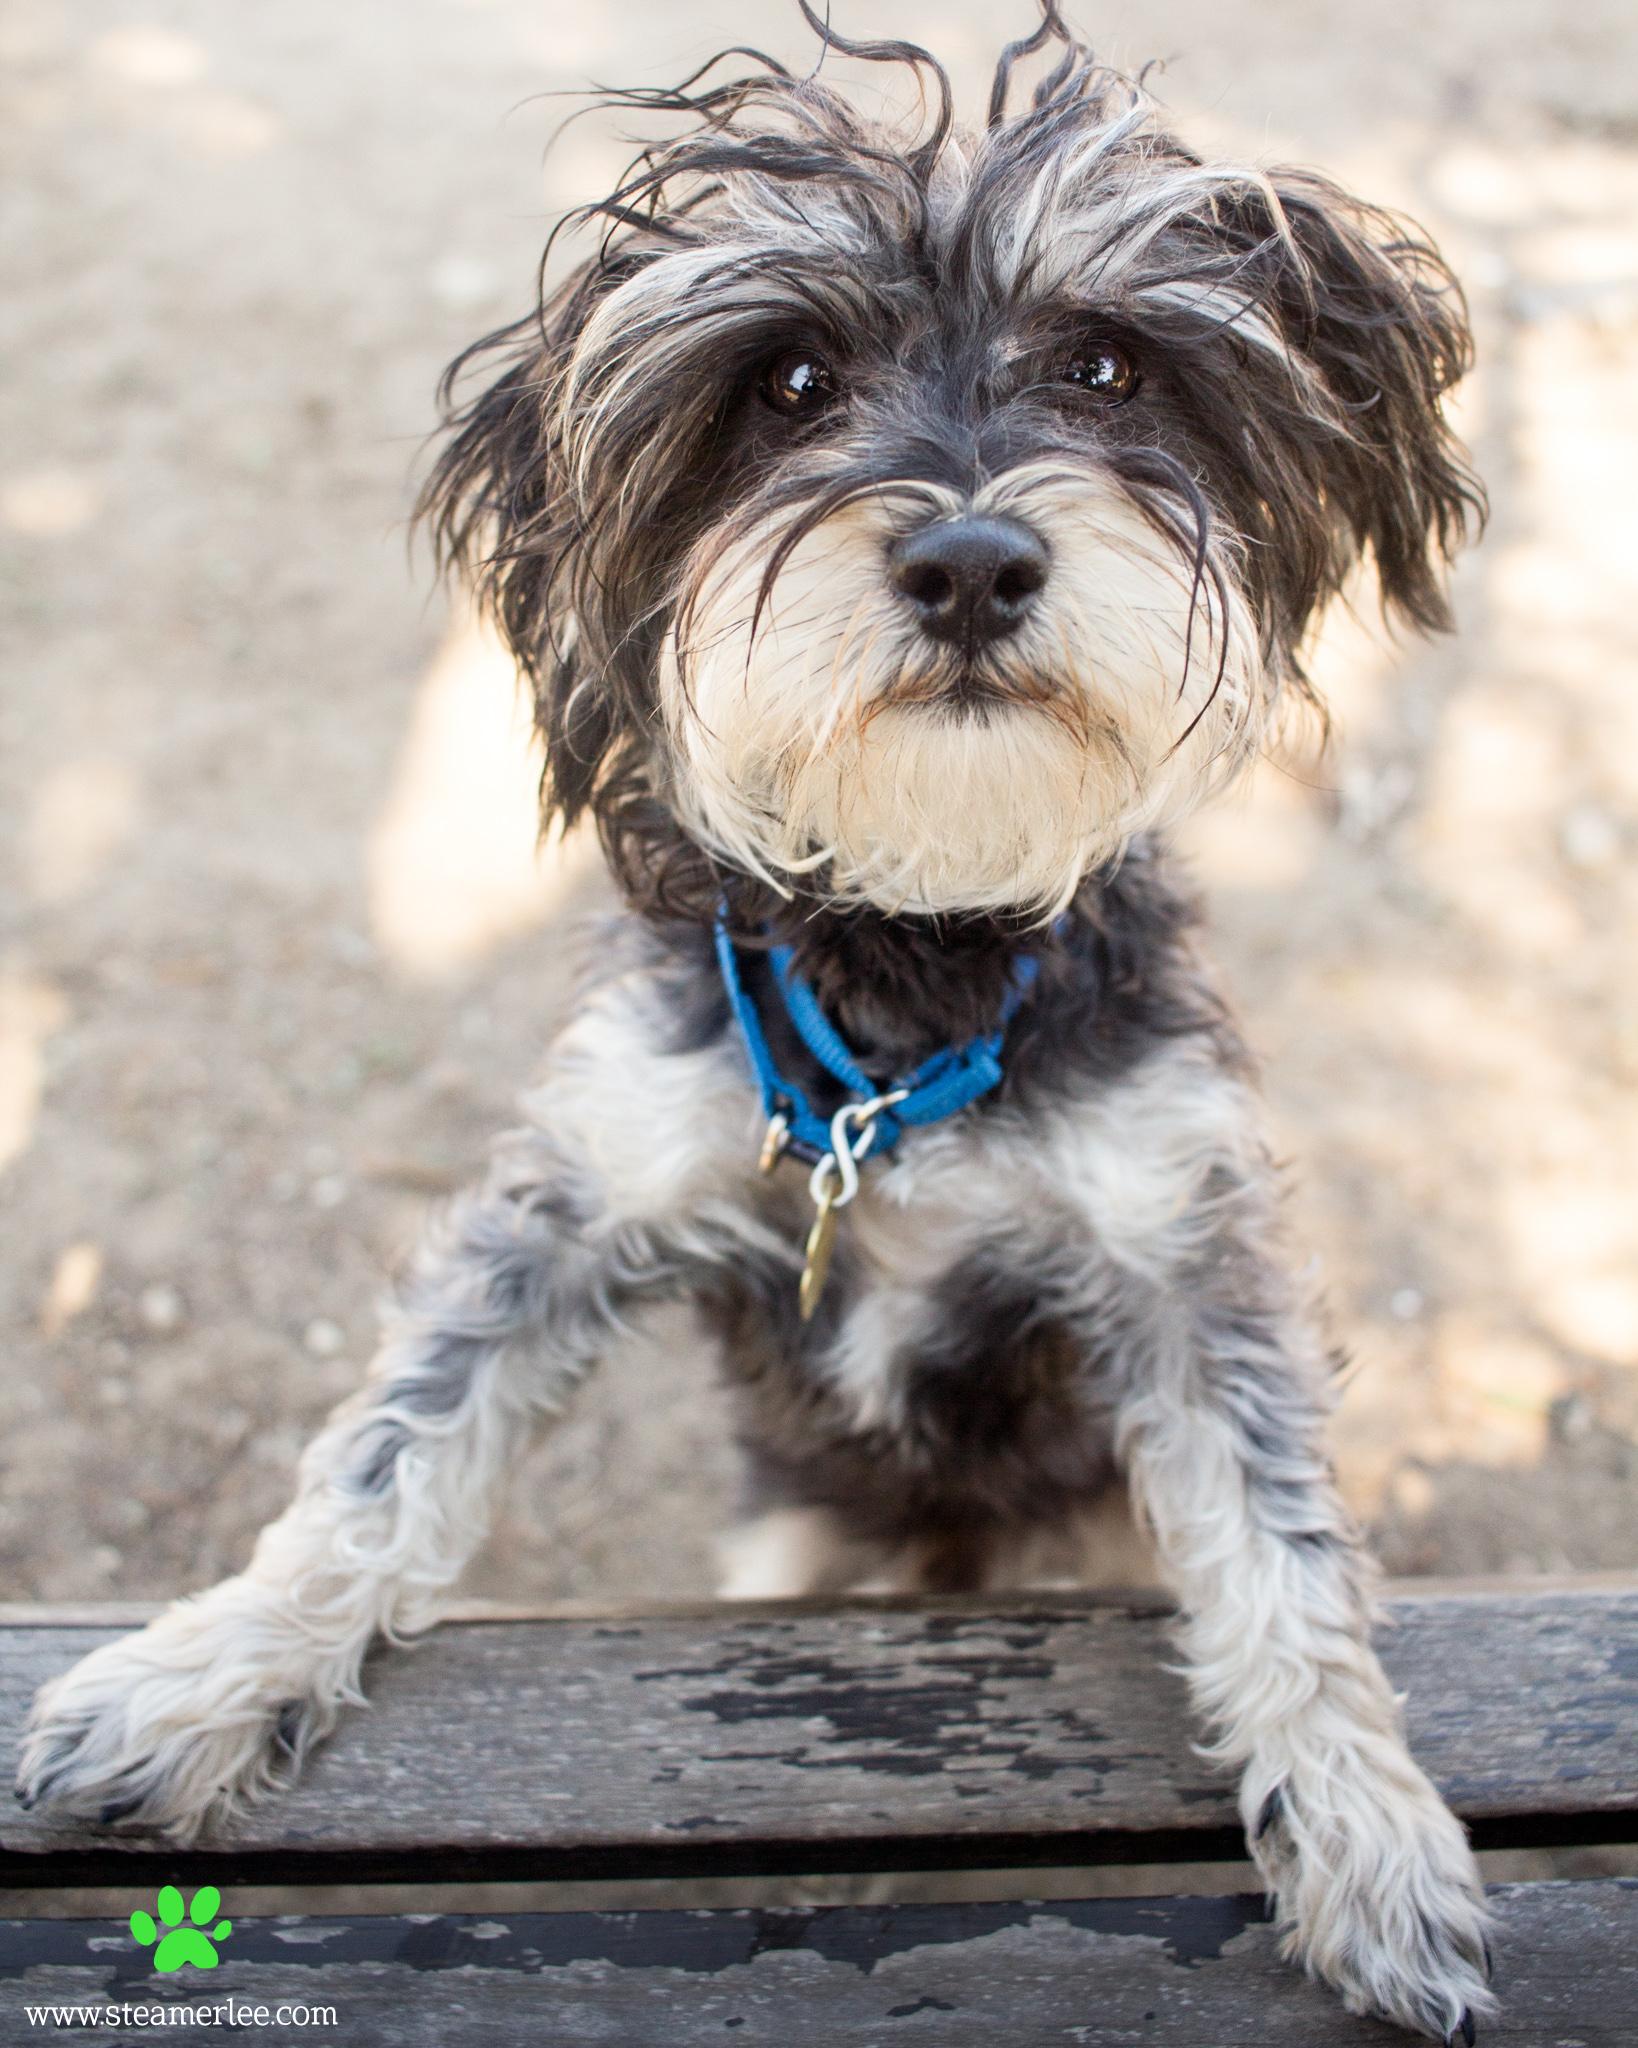 184 Orange County Dog Photography - Steamer Lee - Southern California.JPG